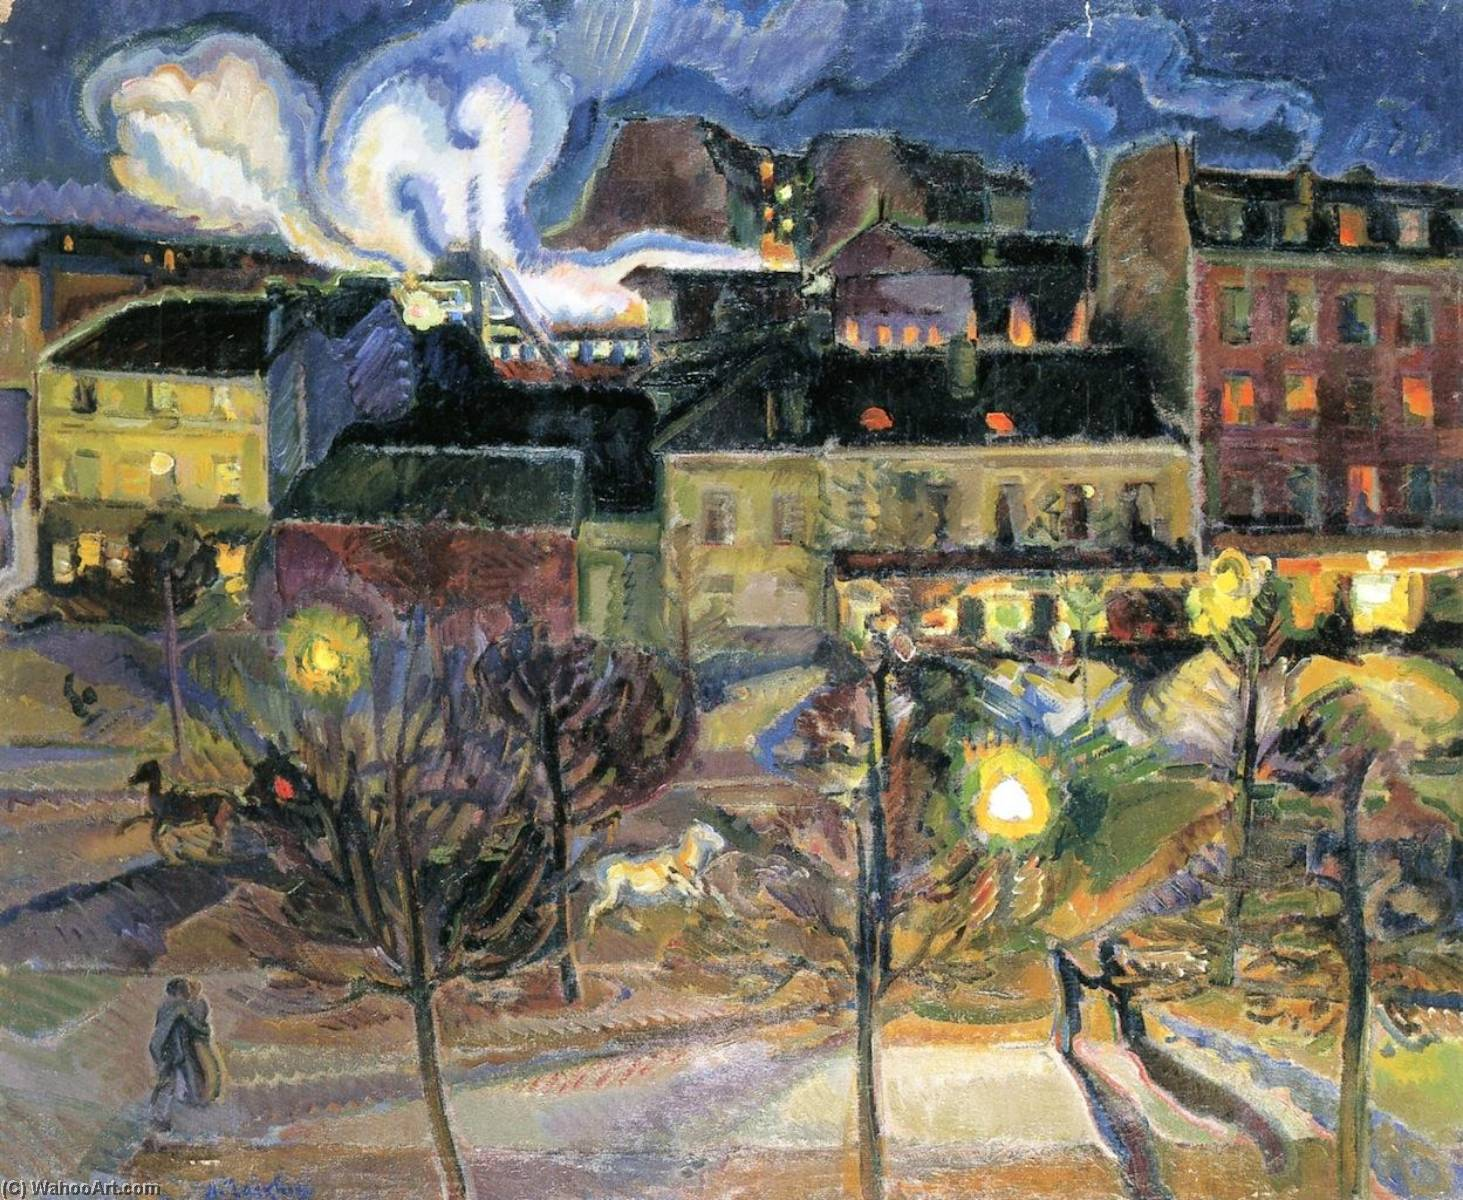 Wikoo.org - موسوعة الفنون الجميلة - اللوحة، العمل الفني Nicolas Tarkhoff - Maine Montmarnasse Railway Station by Night